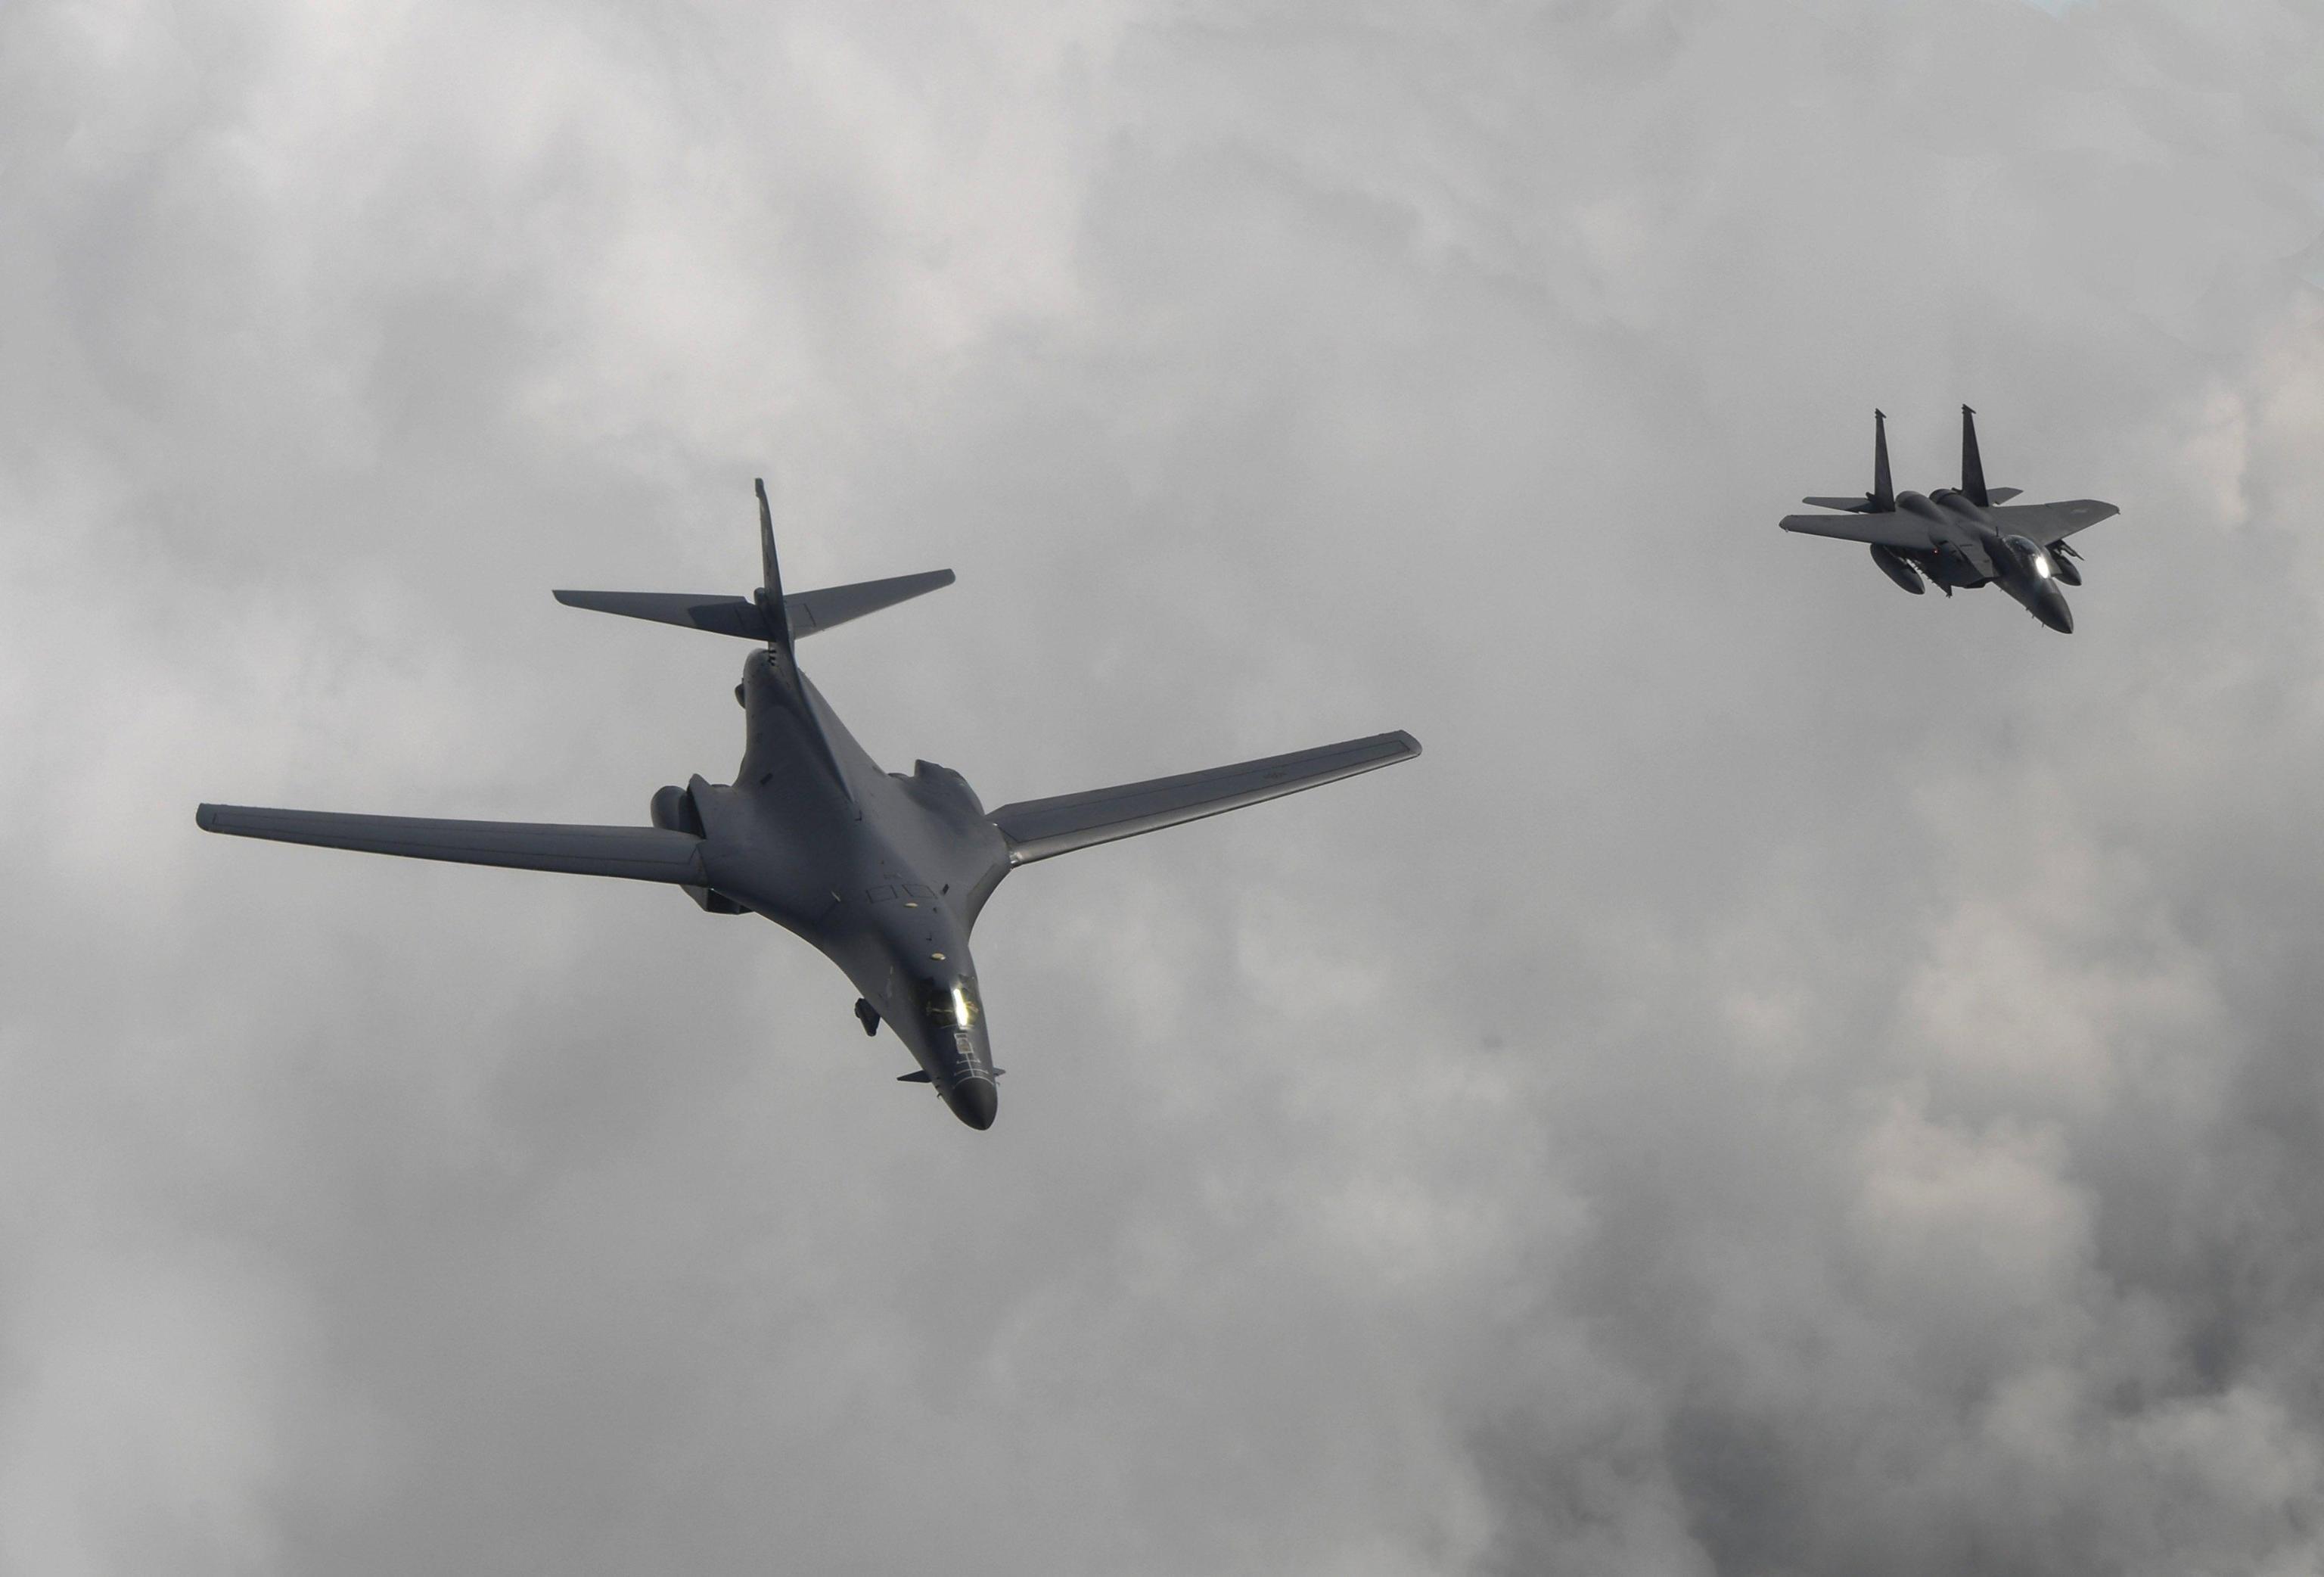 Superbombardiere Usa su penisola coreana